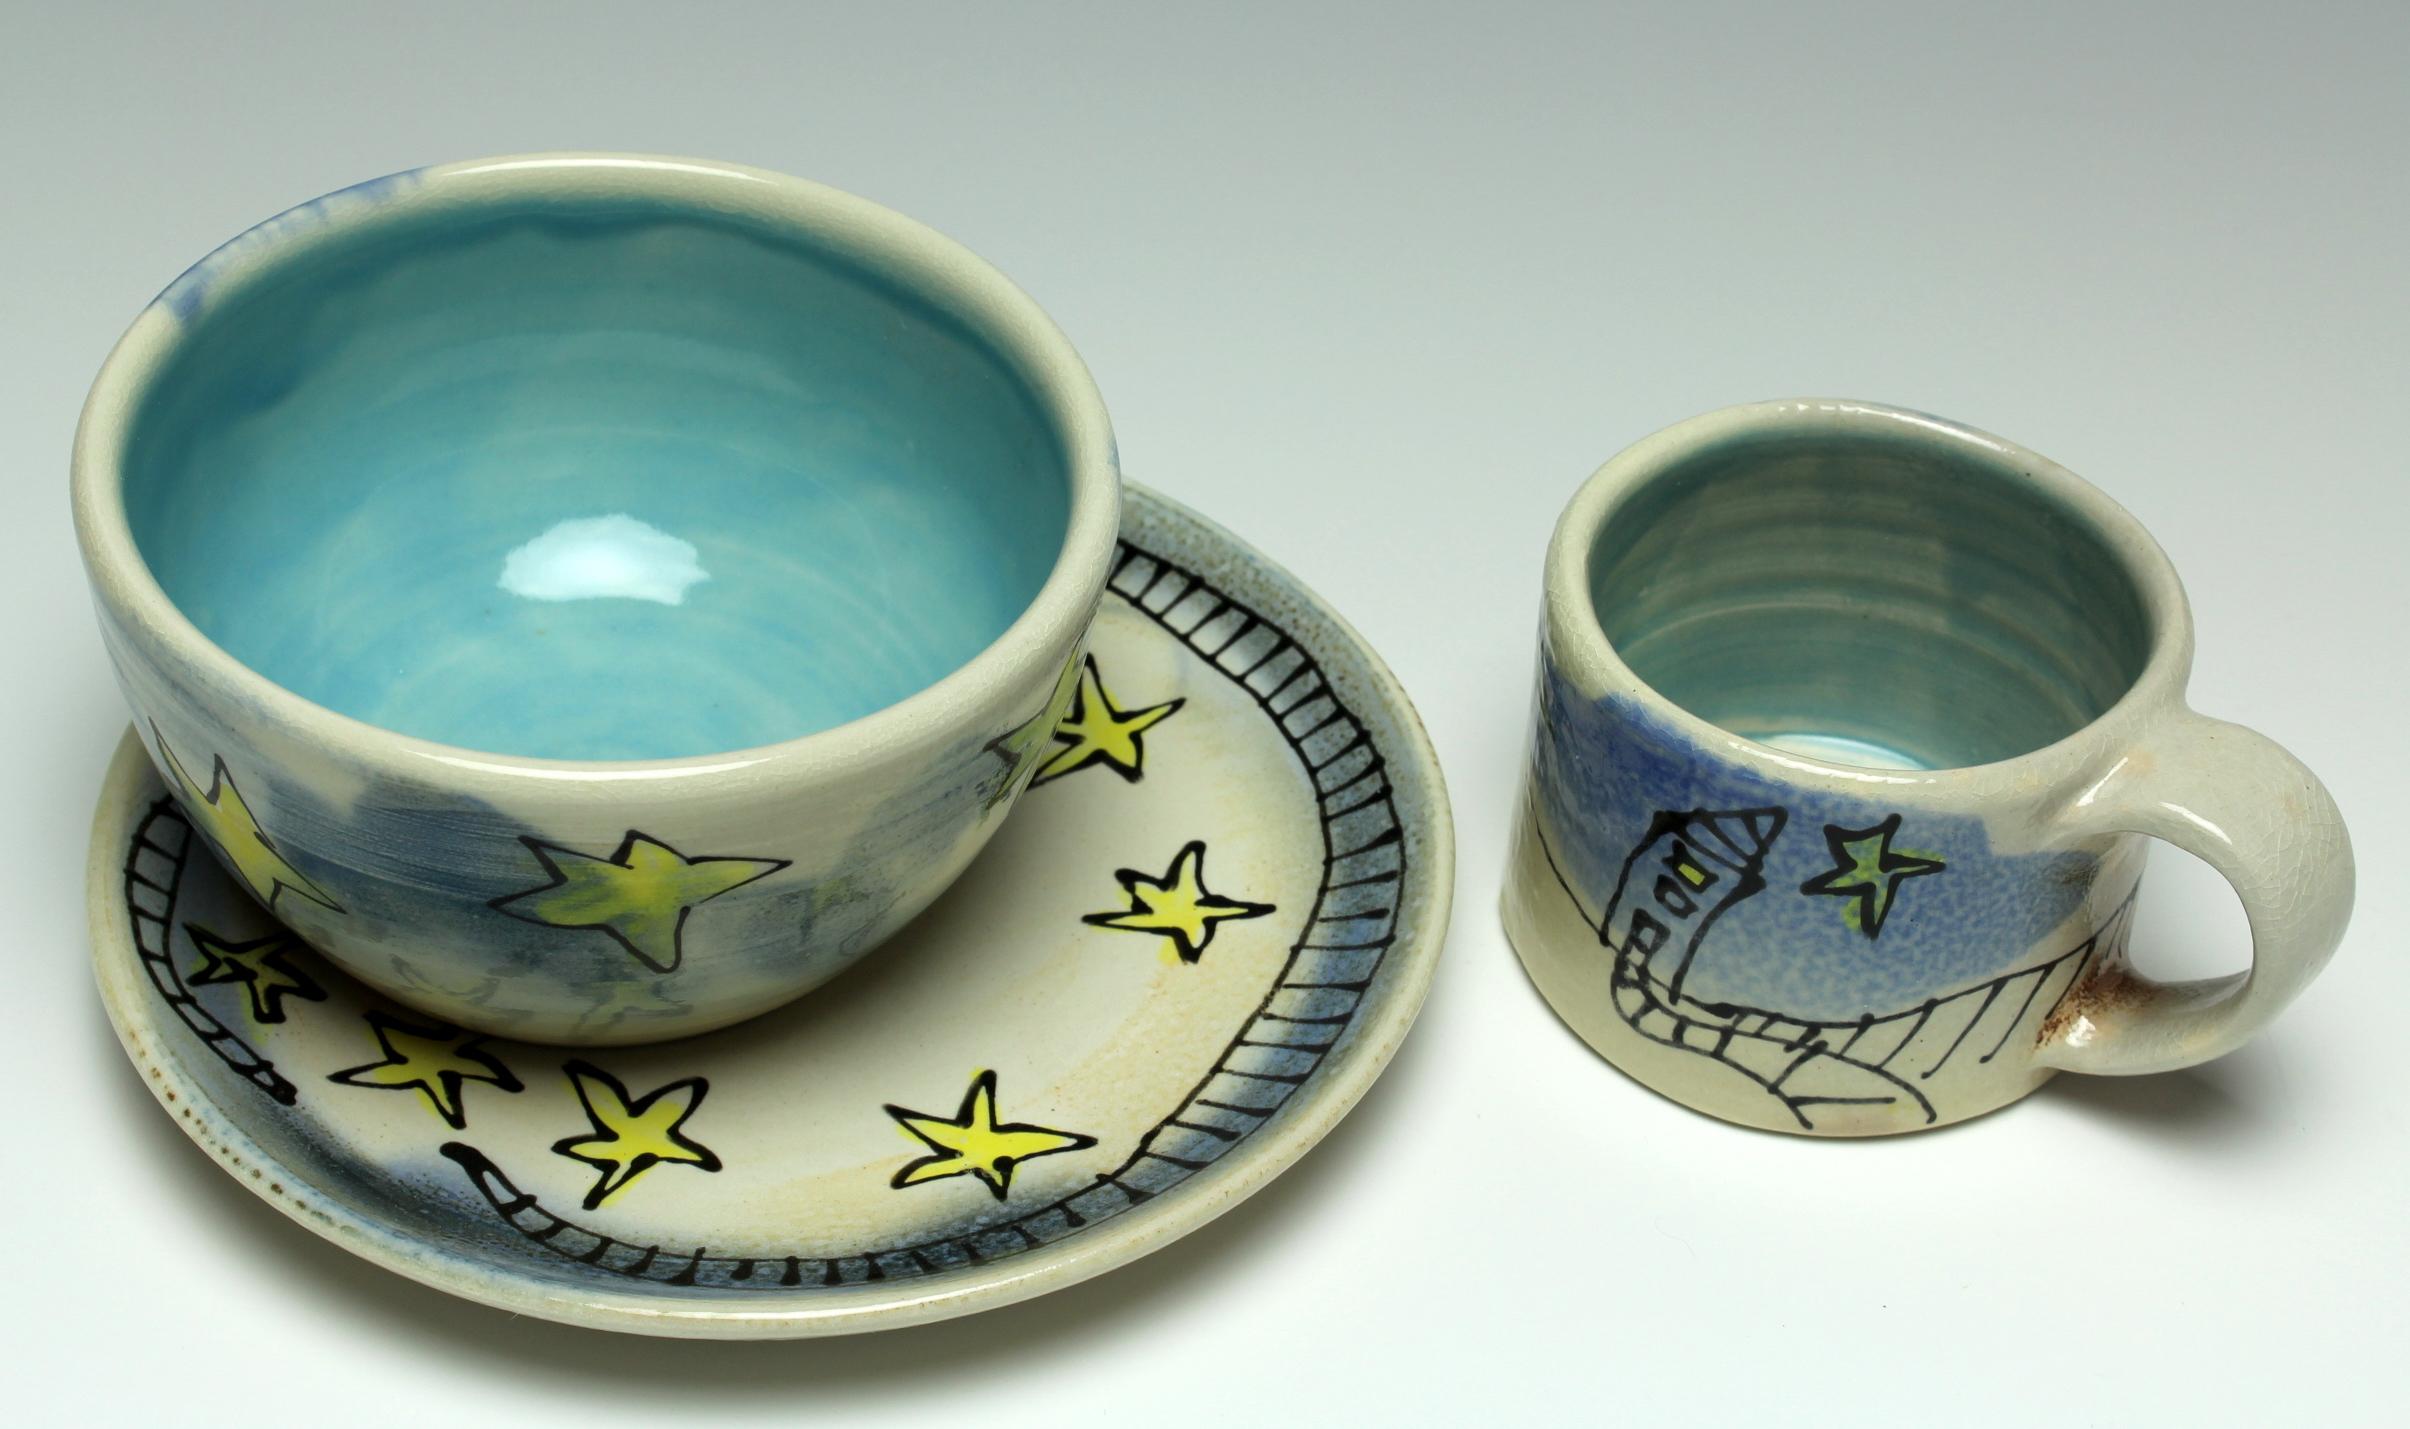 Child's Starry Dish Set